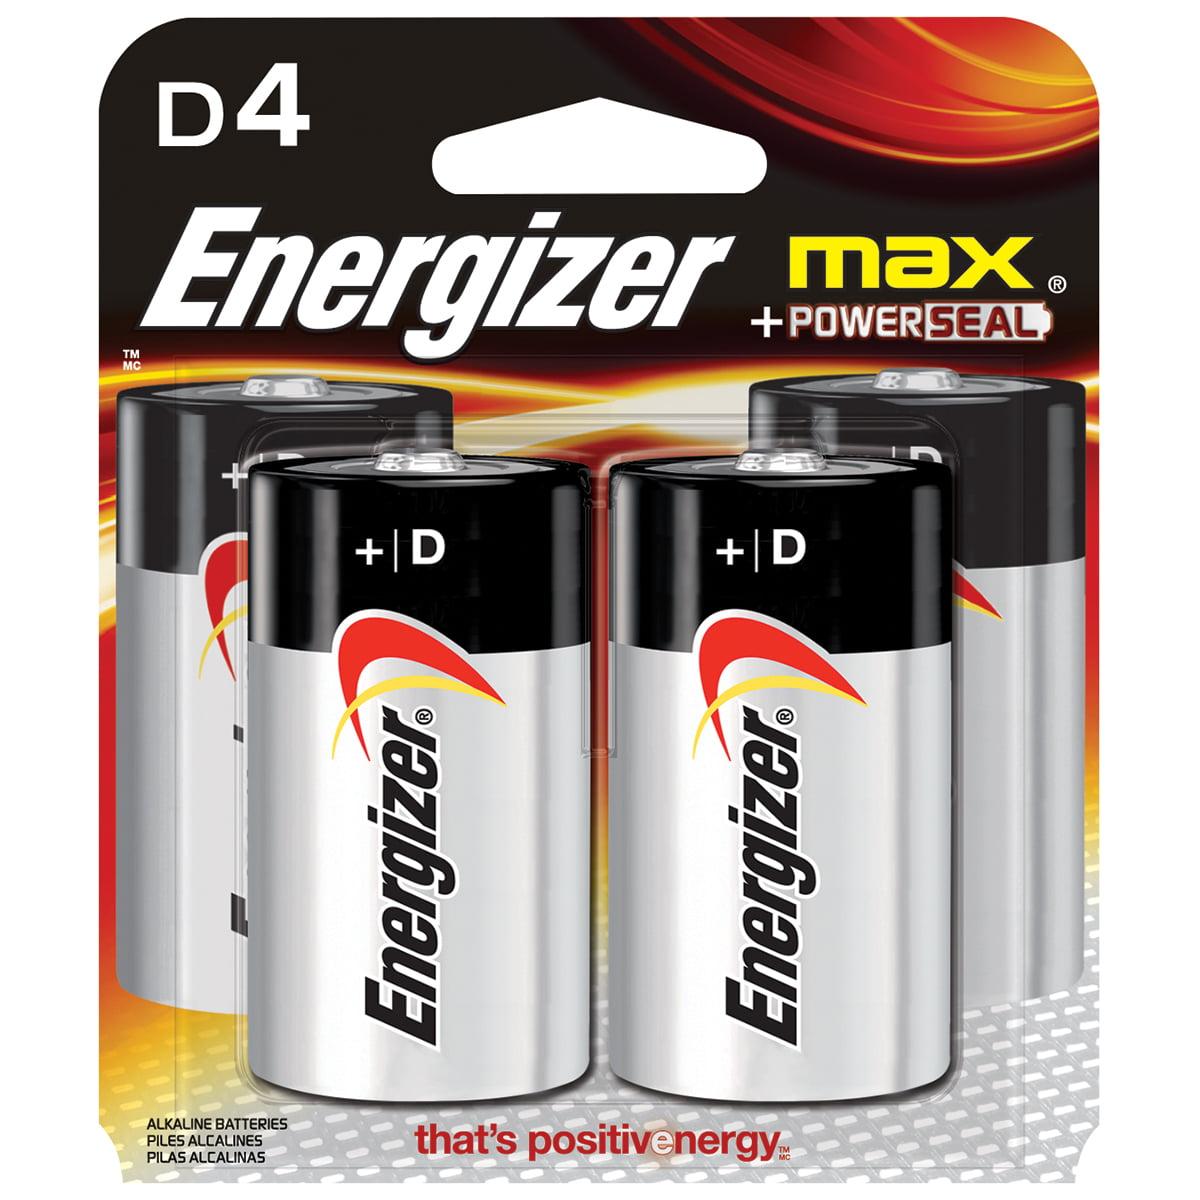 Energizer MAX Alkaline D Batteries, 4-Pack